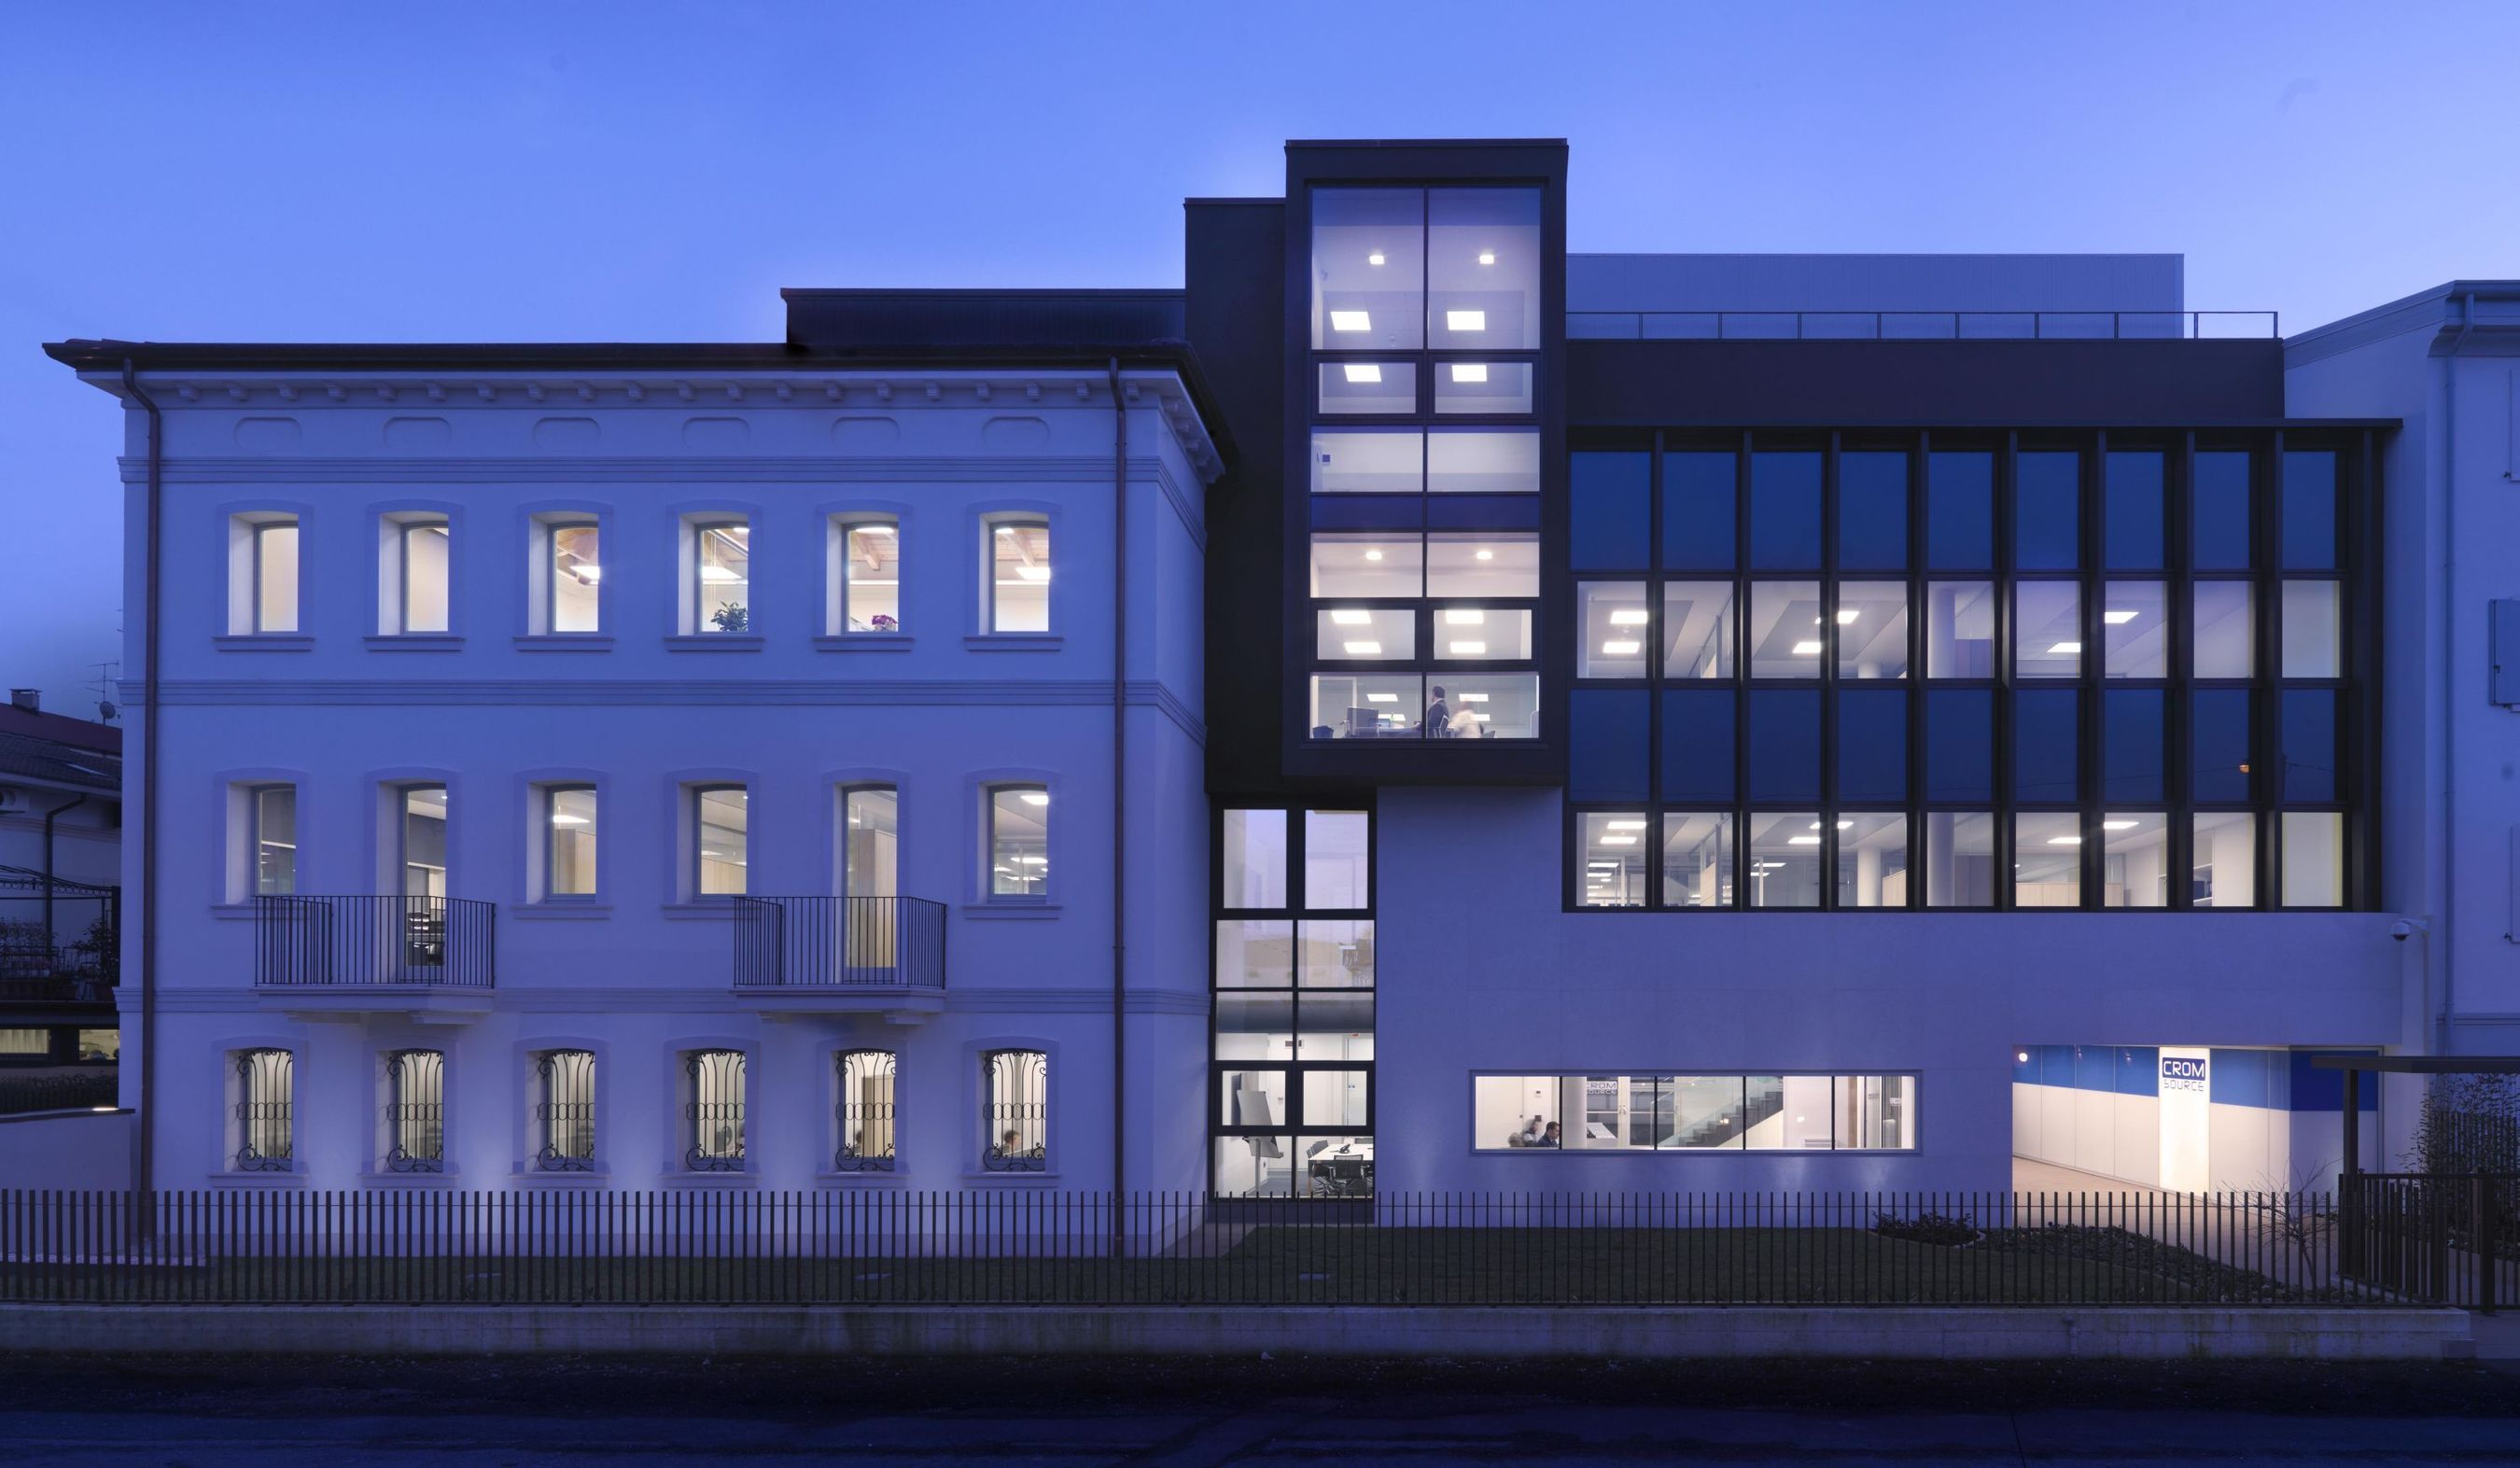 CROMSOURCE's new office building in Verona, Italy (PRNewsFoto/CROMSOURCE)